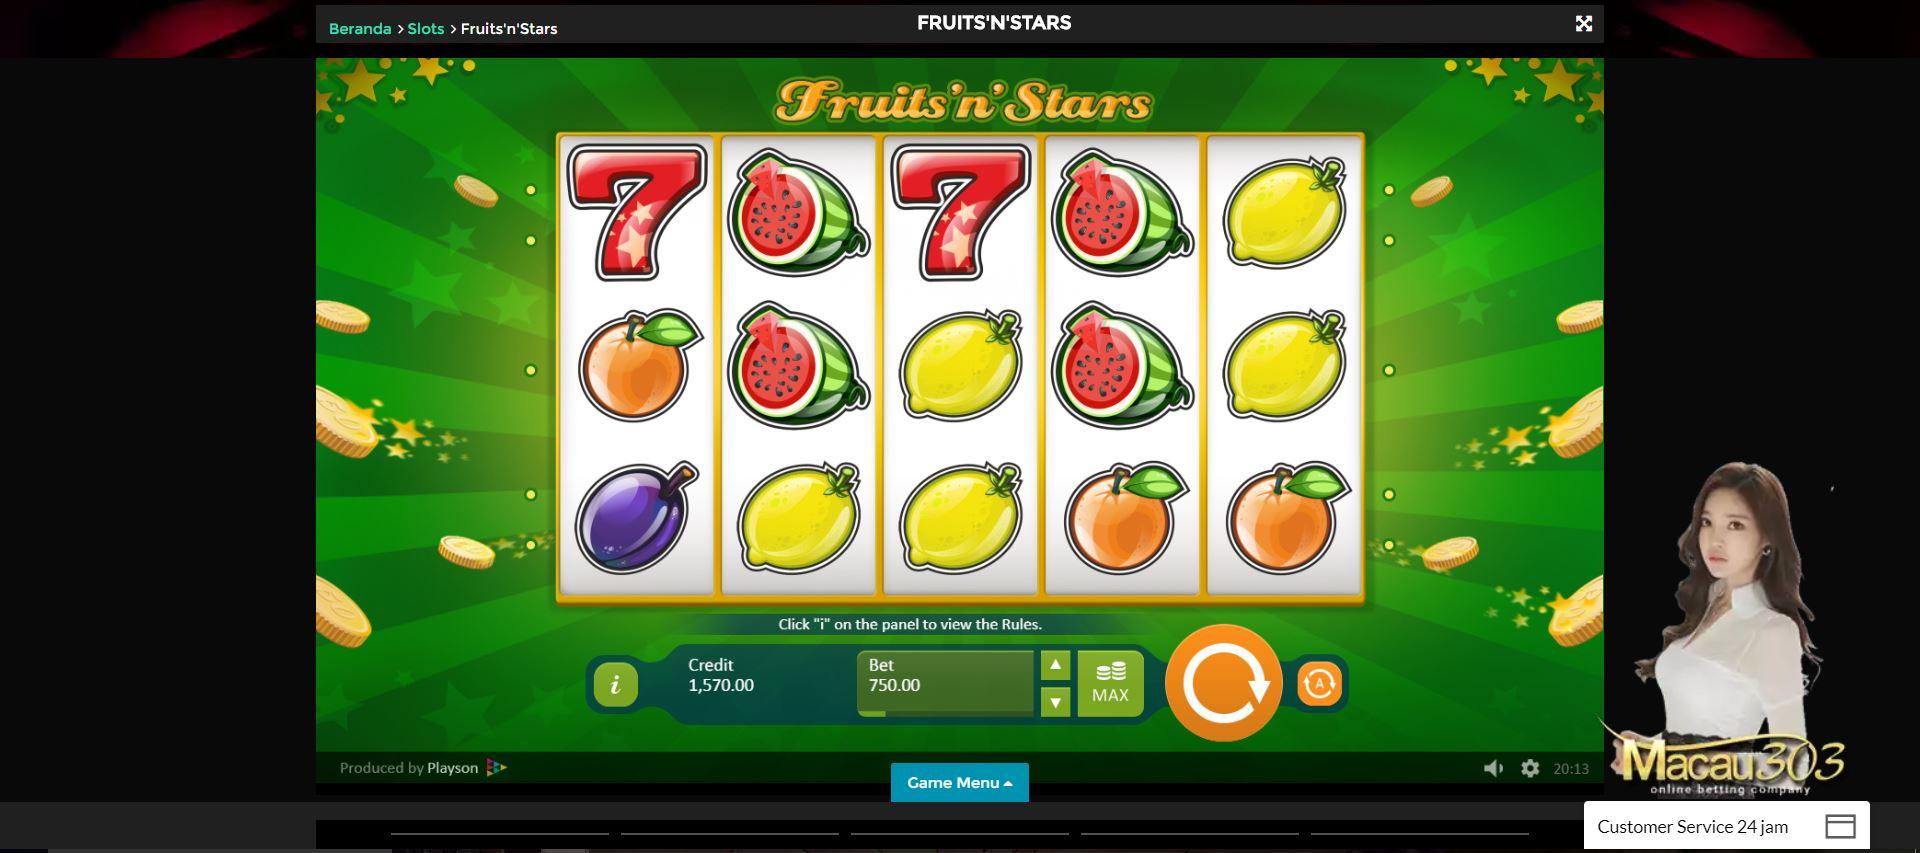 Slot Buah Sebagai Contoh Permainan Casino Online